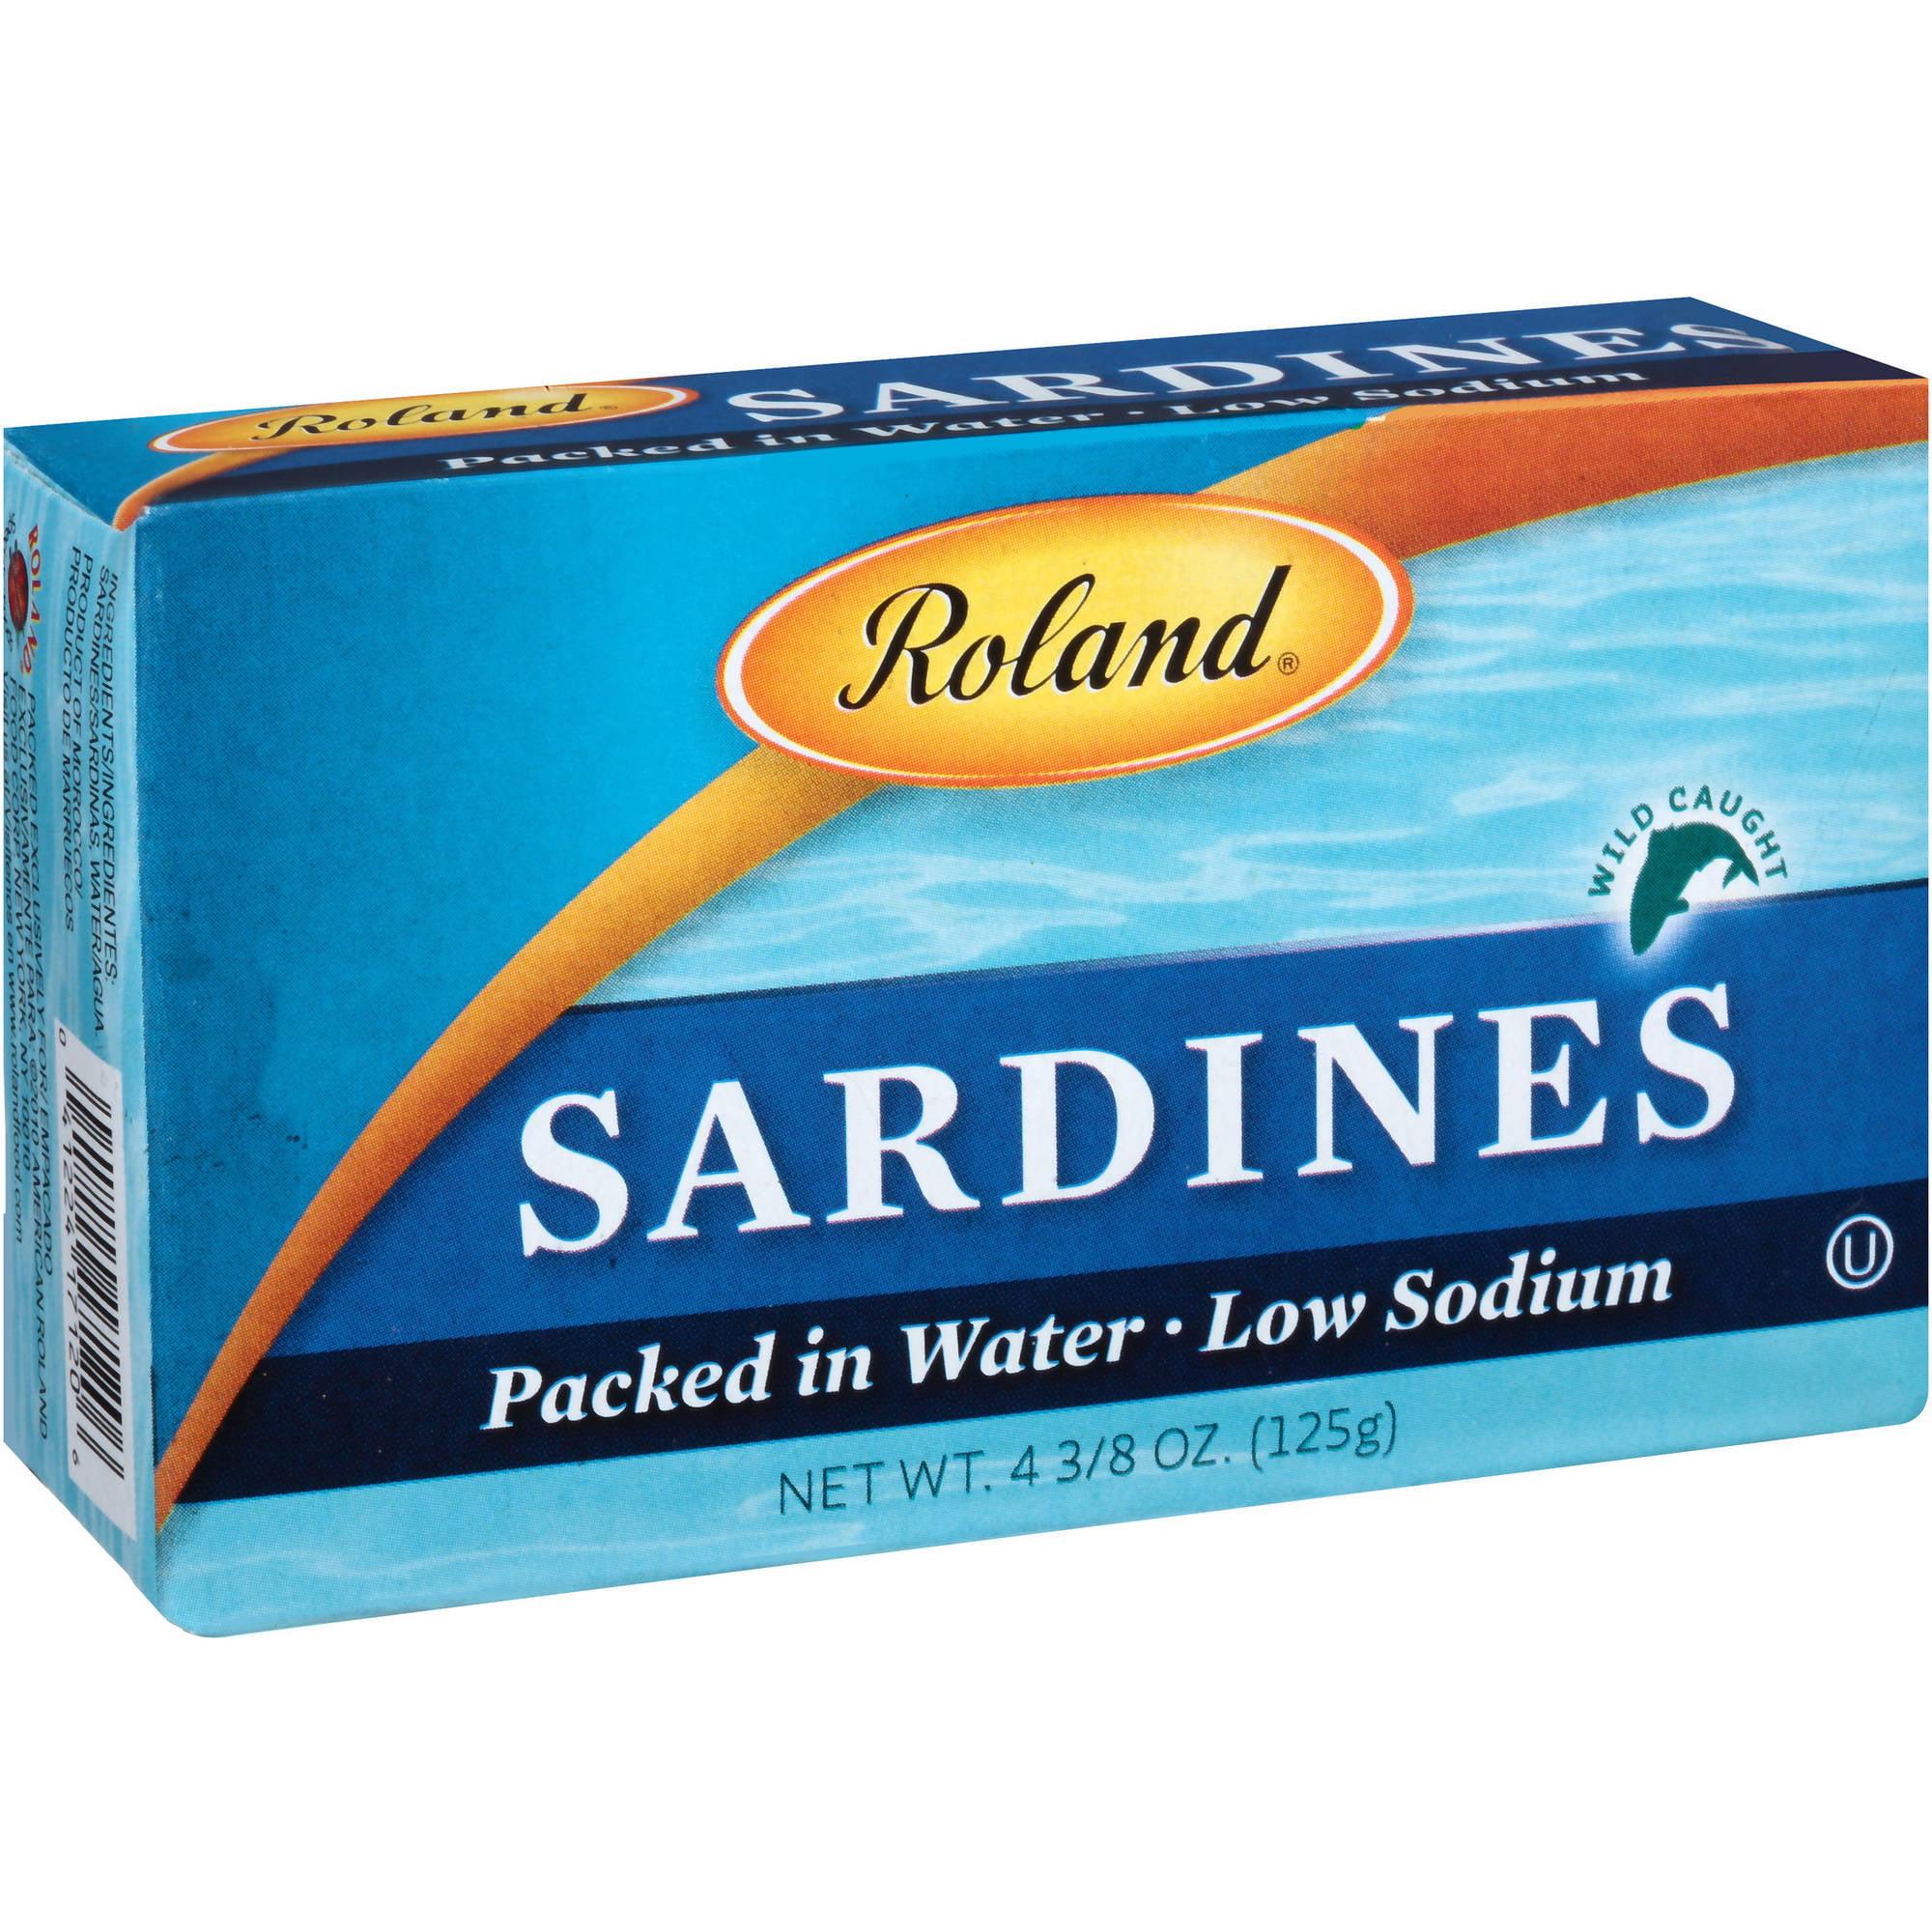 Roland Sardines, 4.375 oz,(Pack of 10)